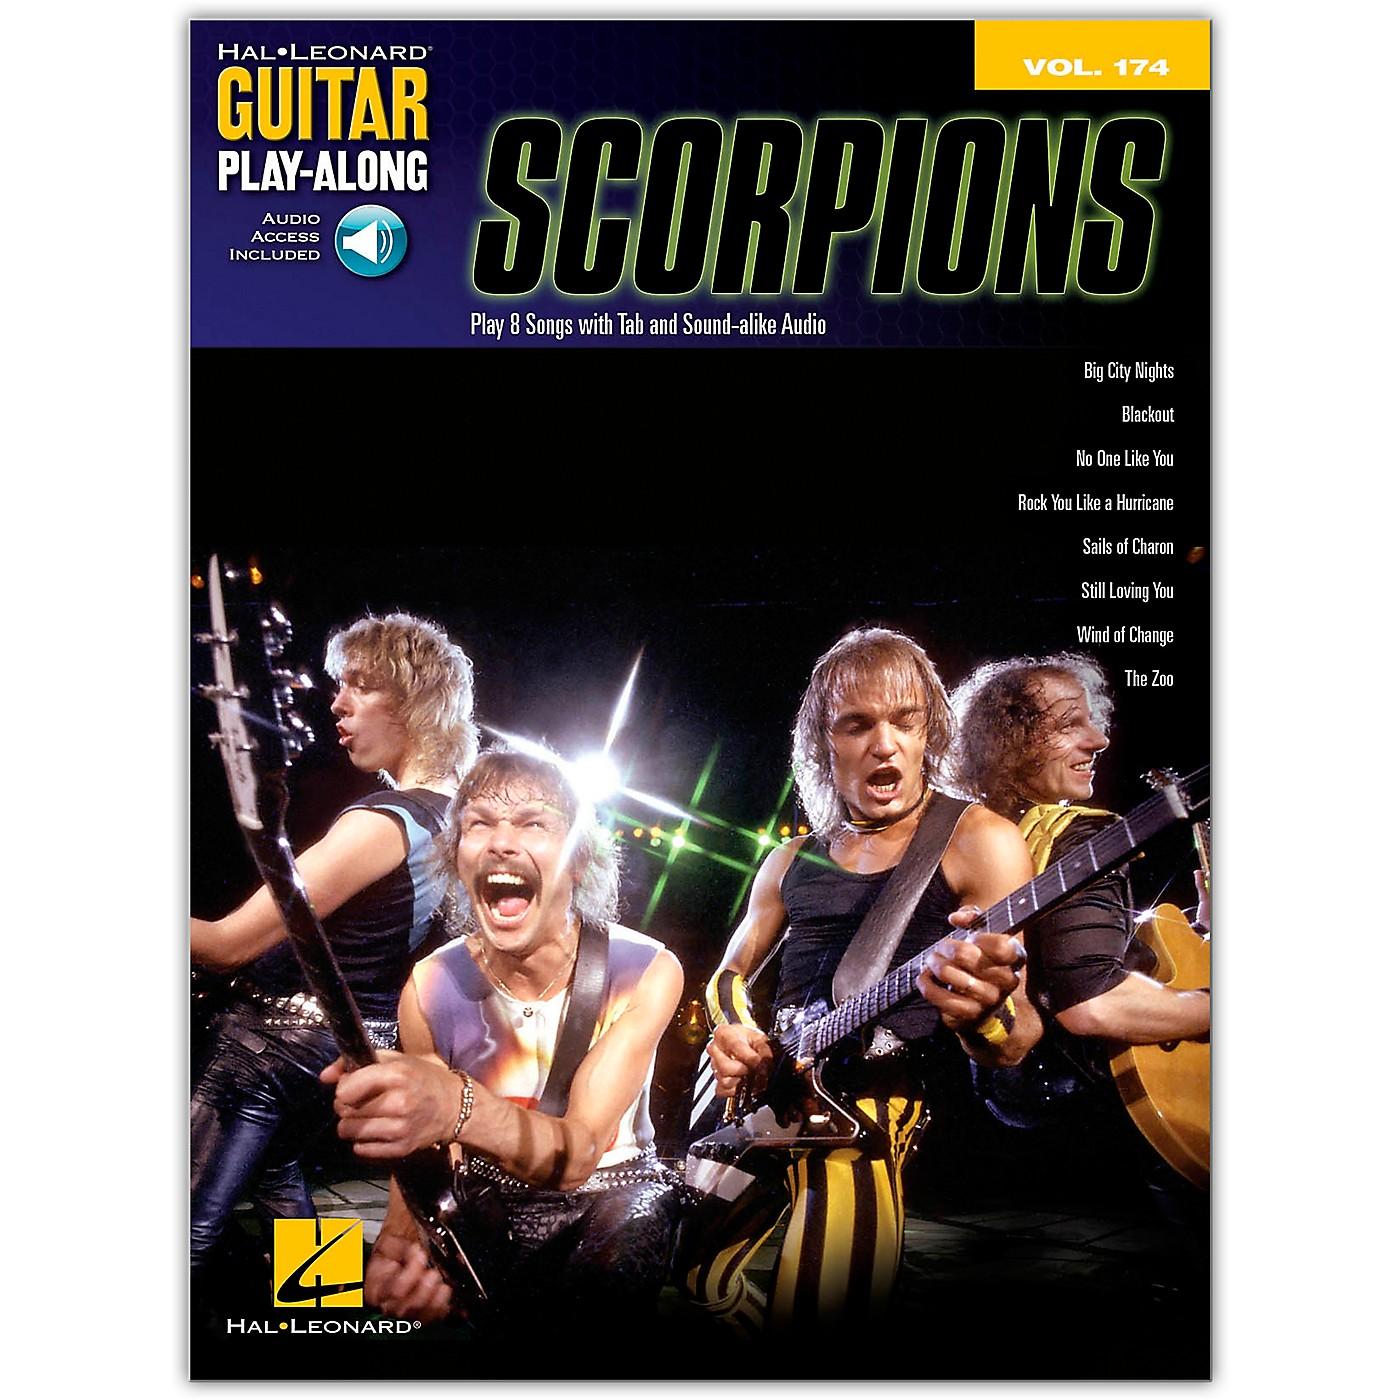 Hal Leonard Scorpions - Guitar Play-Along Vol. 174 Book/Online Audio thumbnail